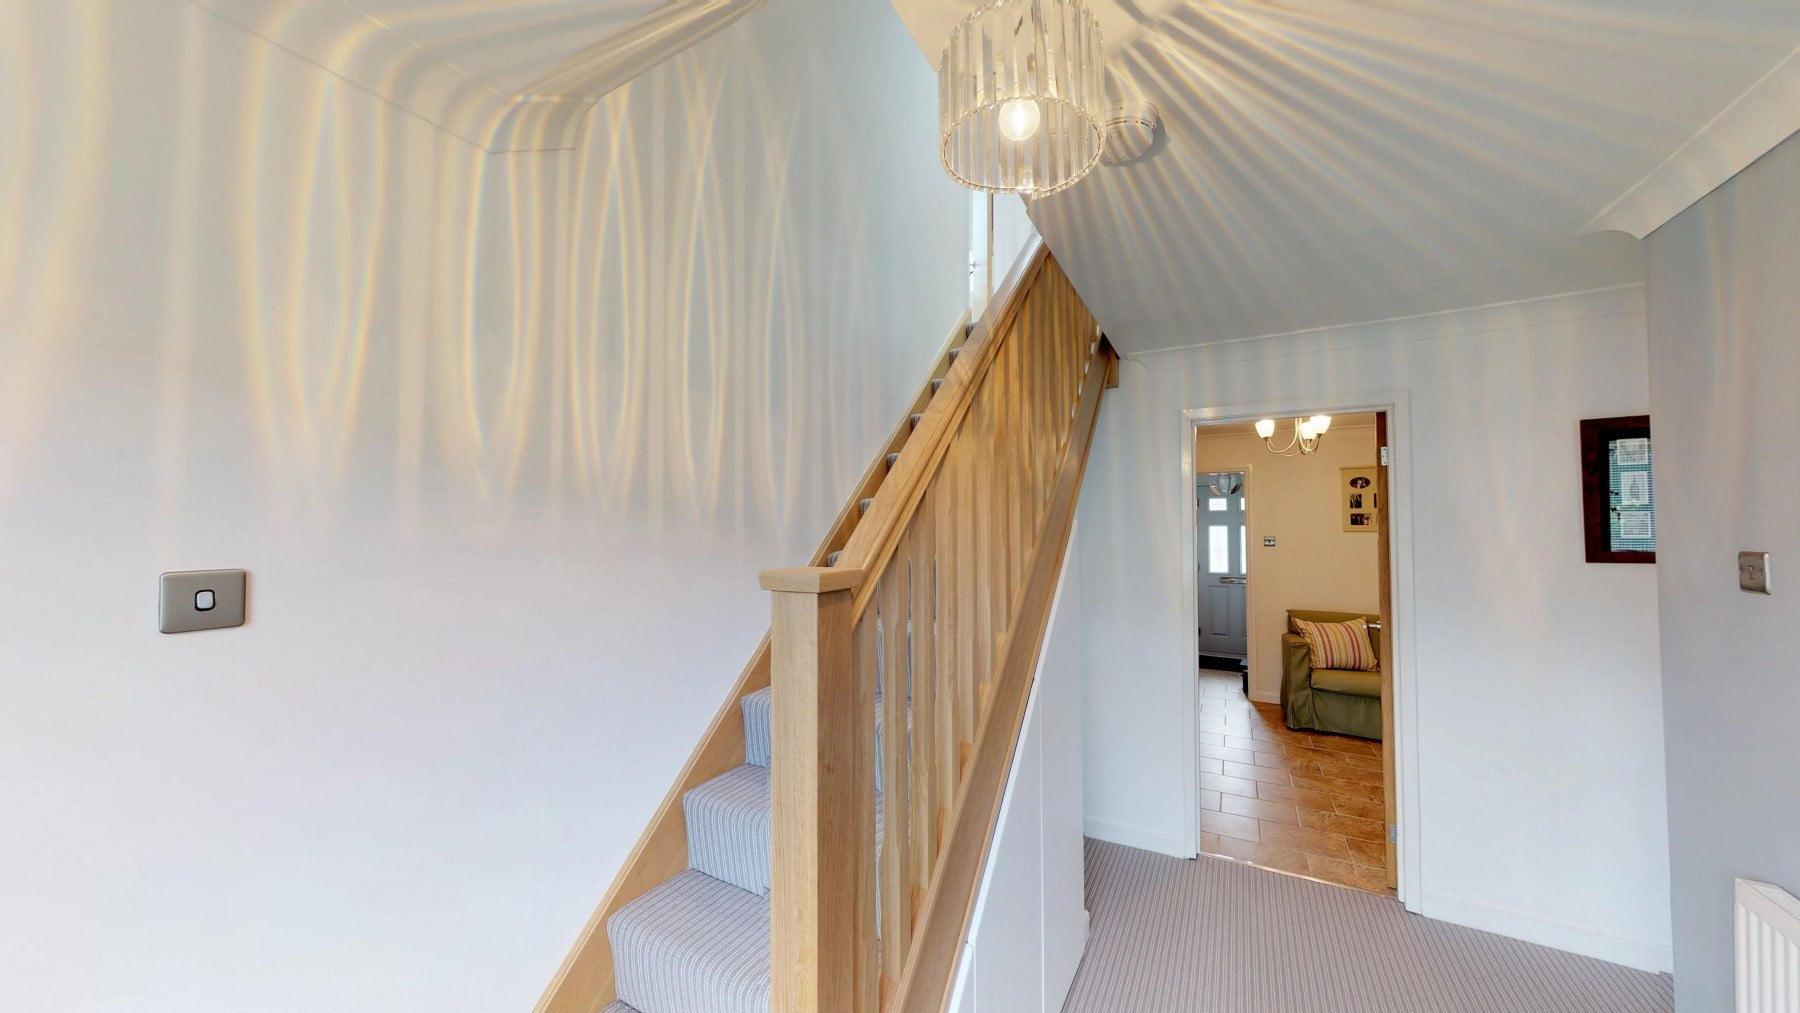 Loft-Pro-Multi-Room-Bungalow-Velux-10022018_164808